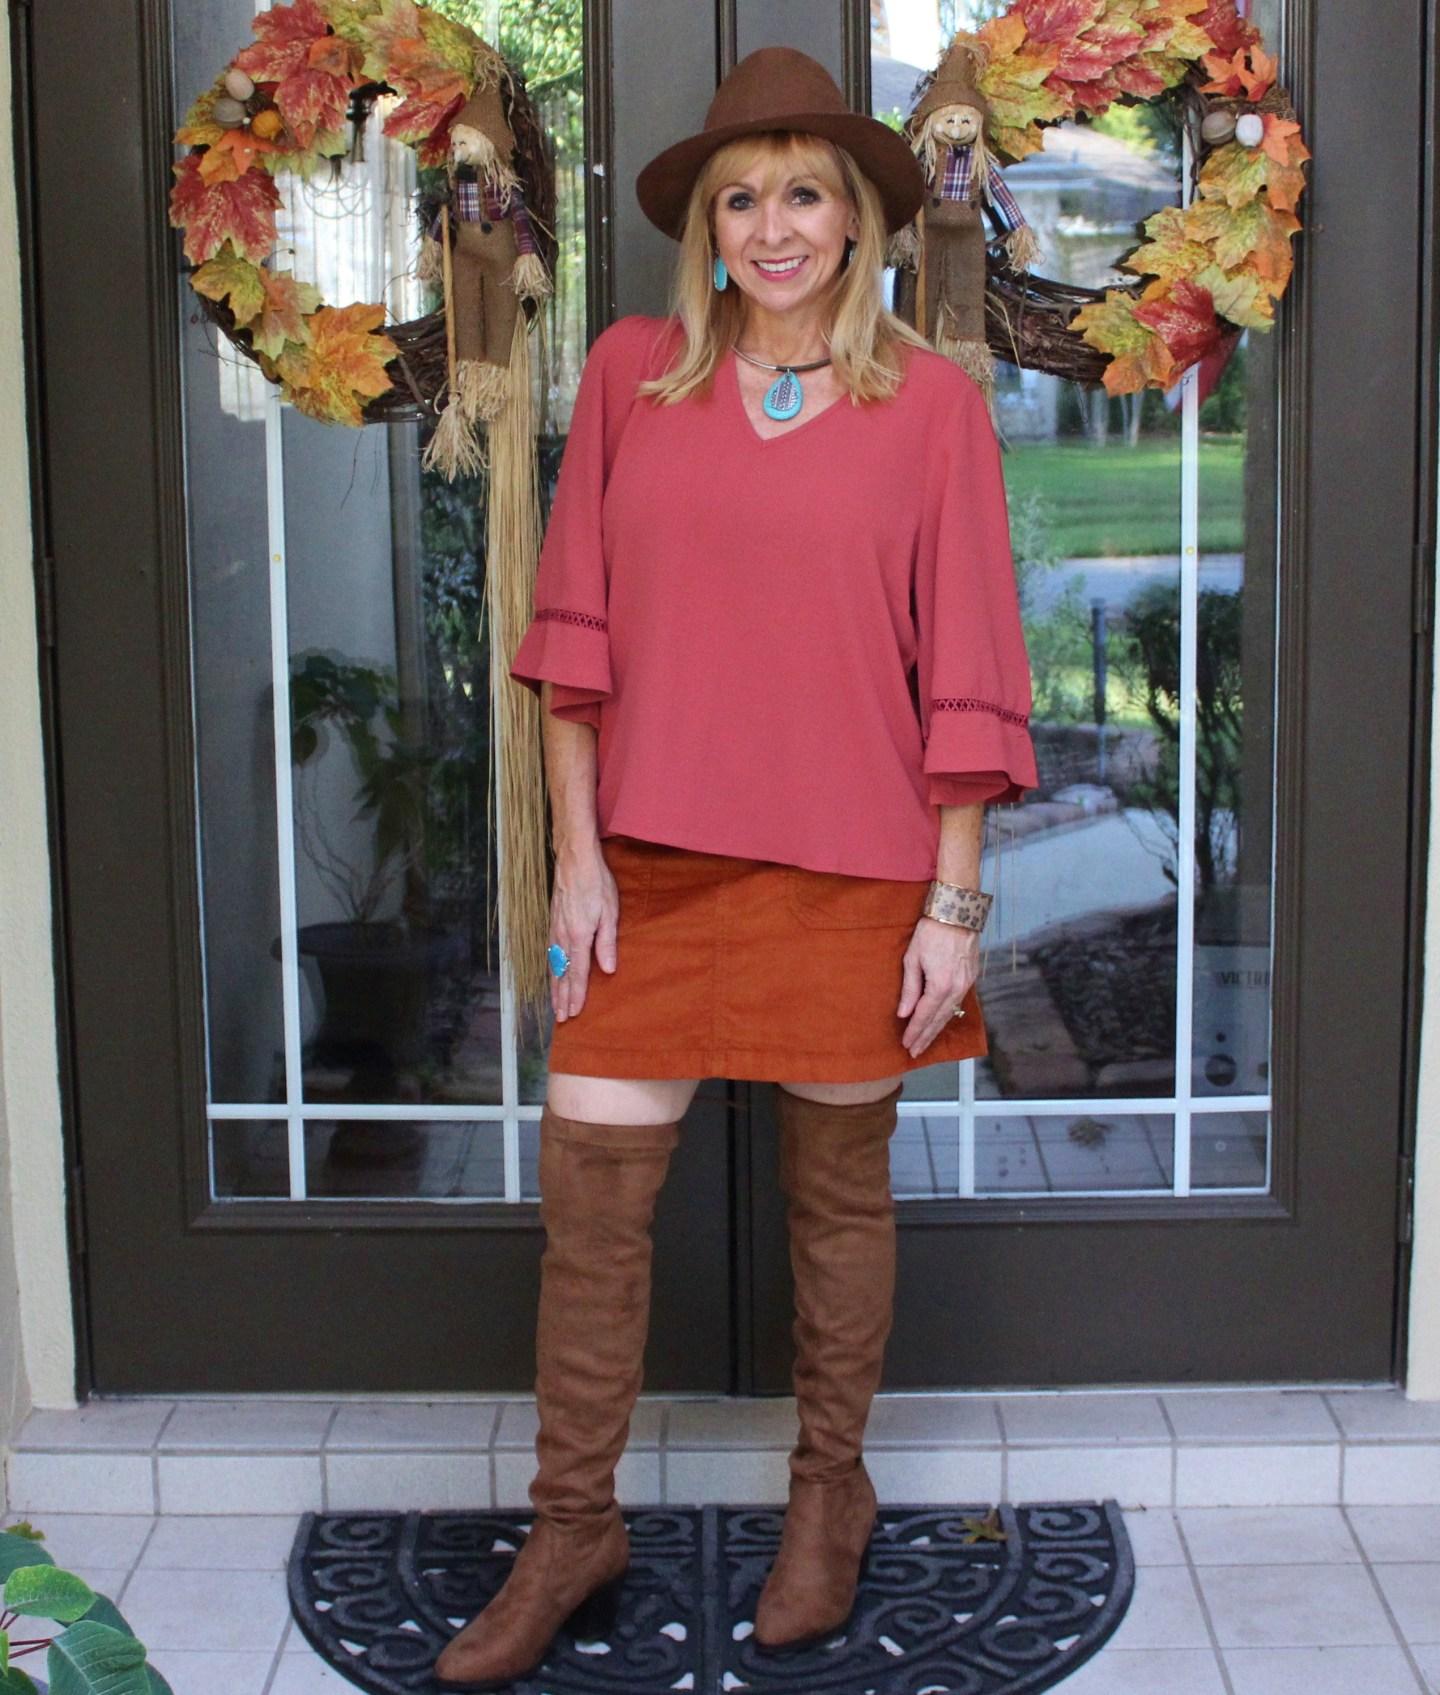 Rust blouse + Corduroy Skirt + OTK boots + Boho Hat